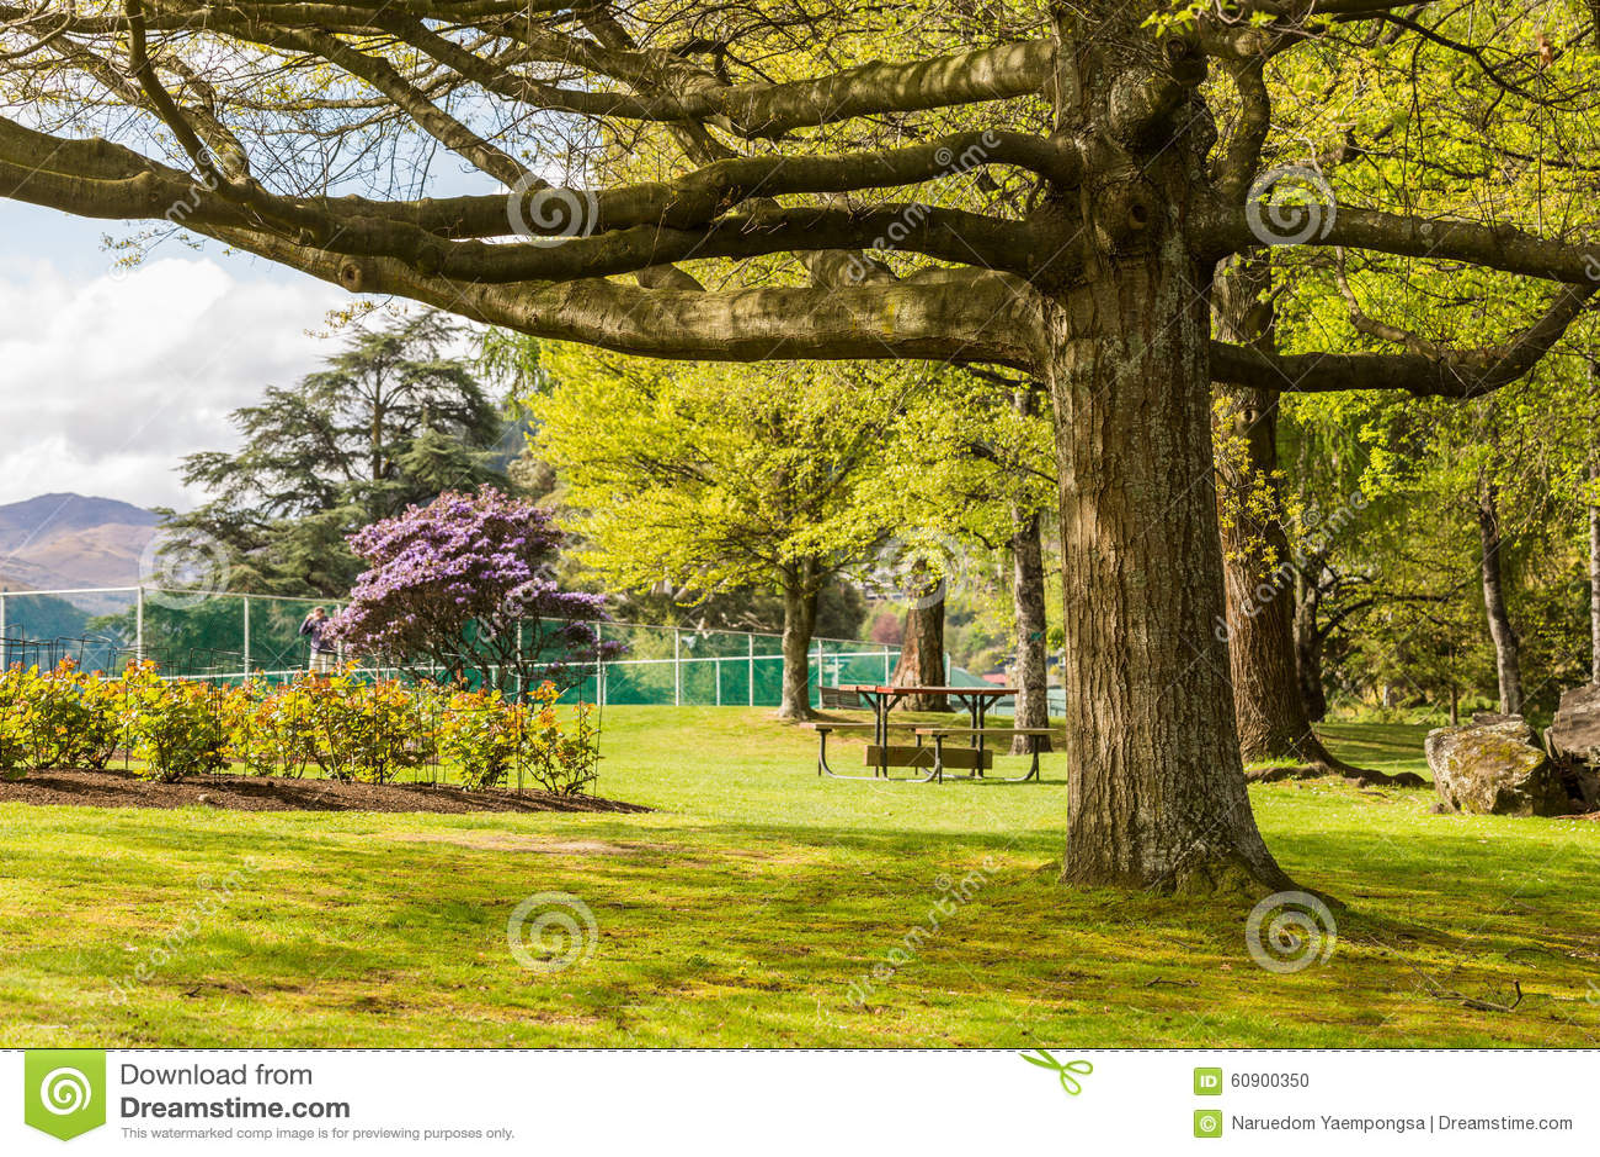 Big Tree In Garden Stock Photo Image Of Tree Bench